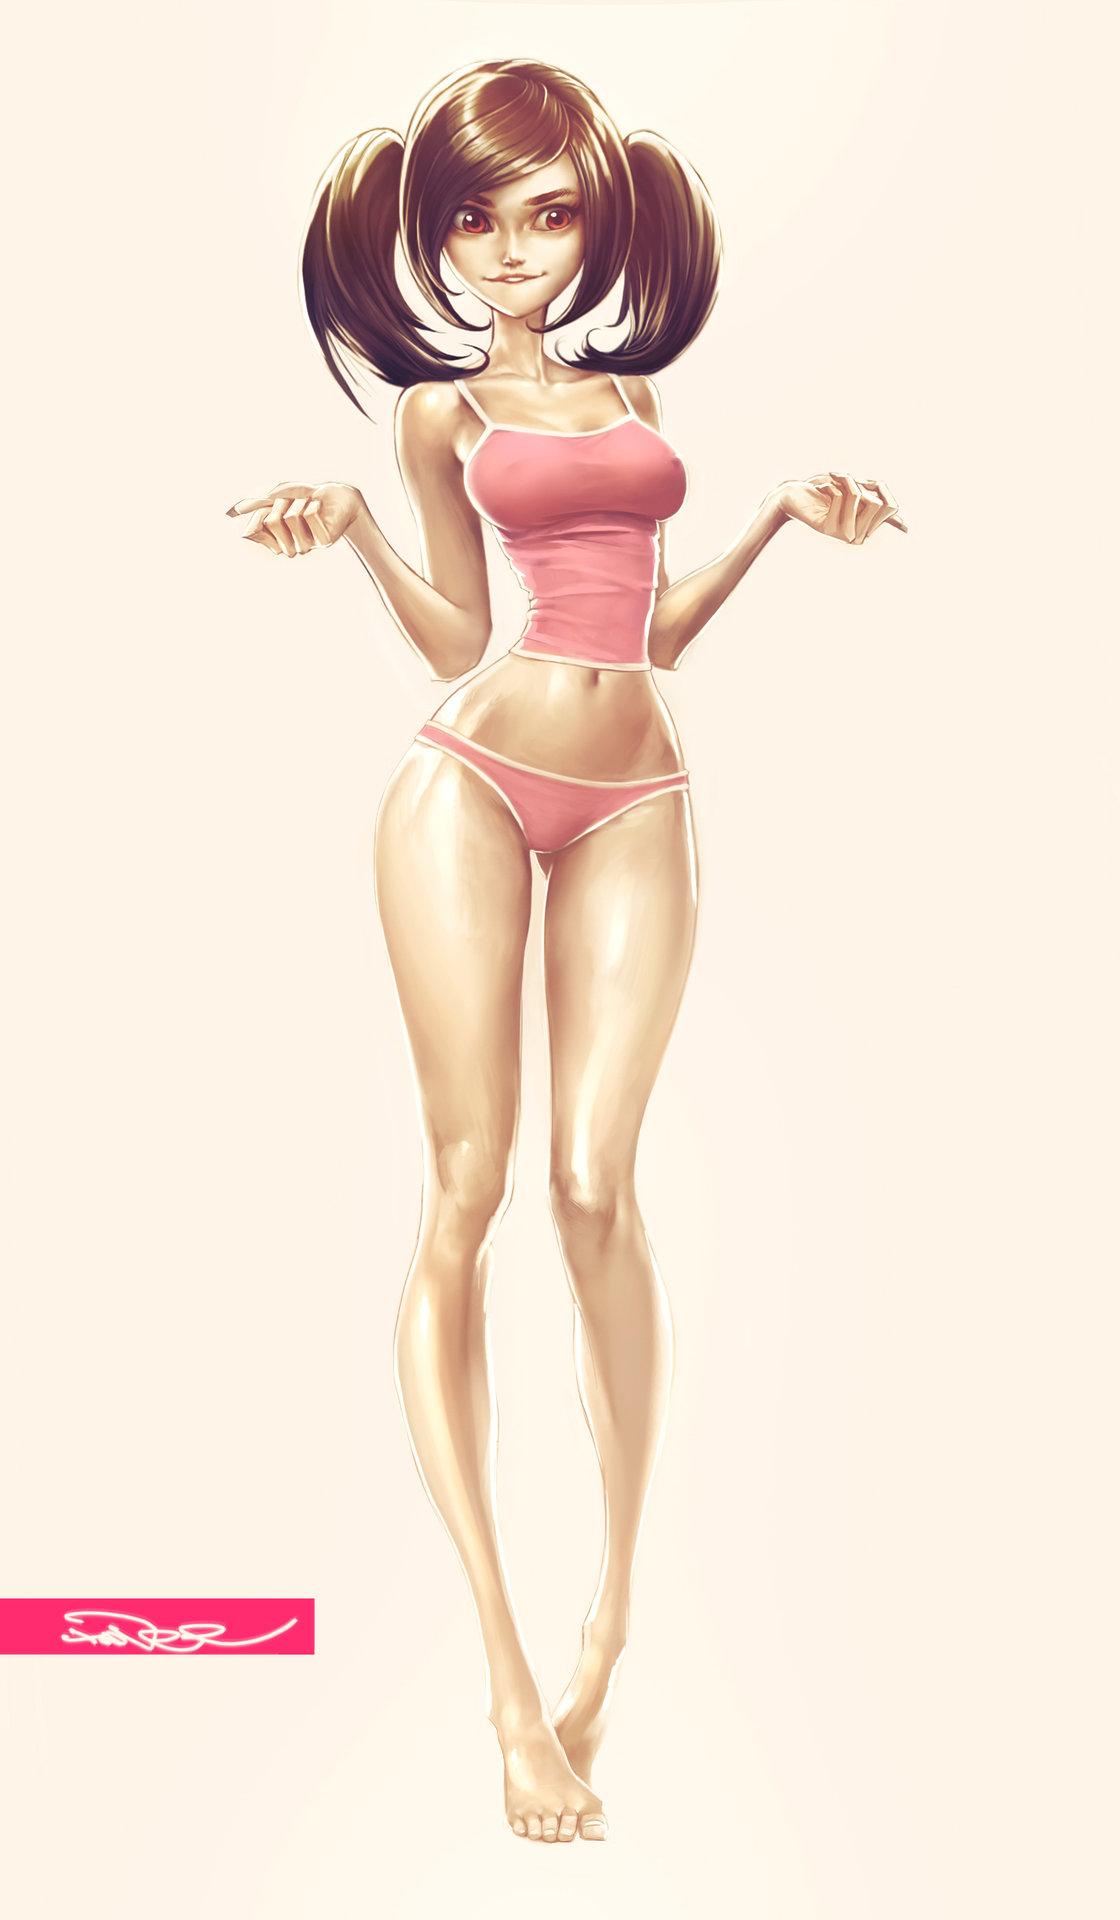 Artstation - Light Sexy Girl, Nicolai Tudi-4575